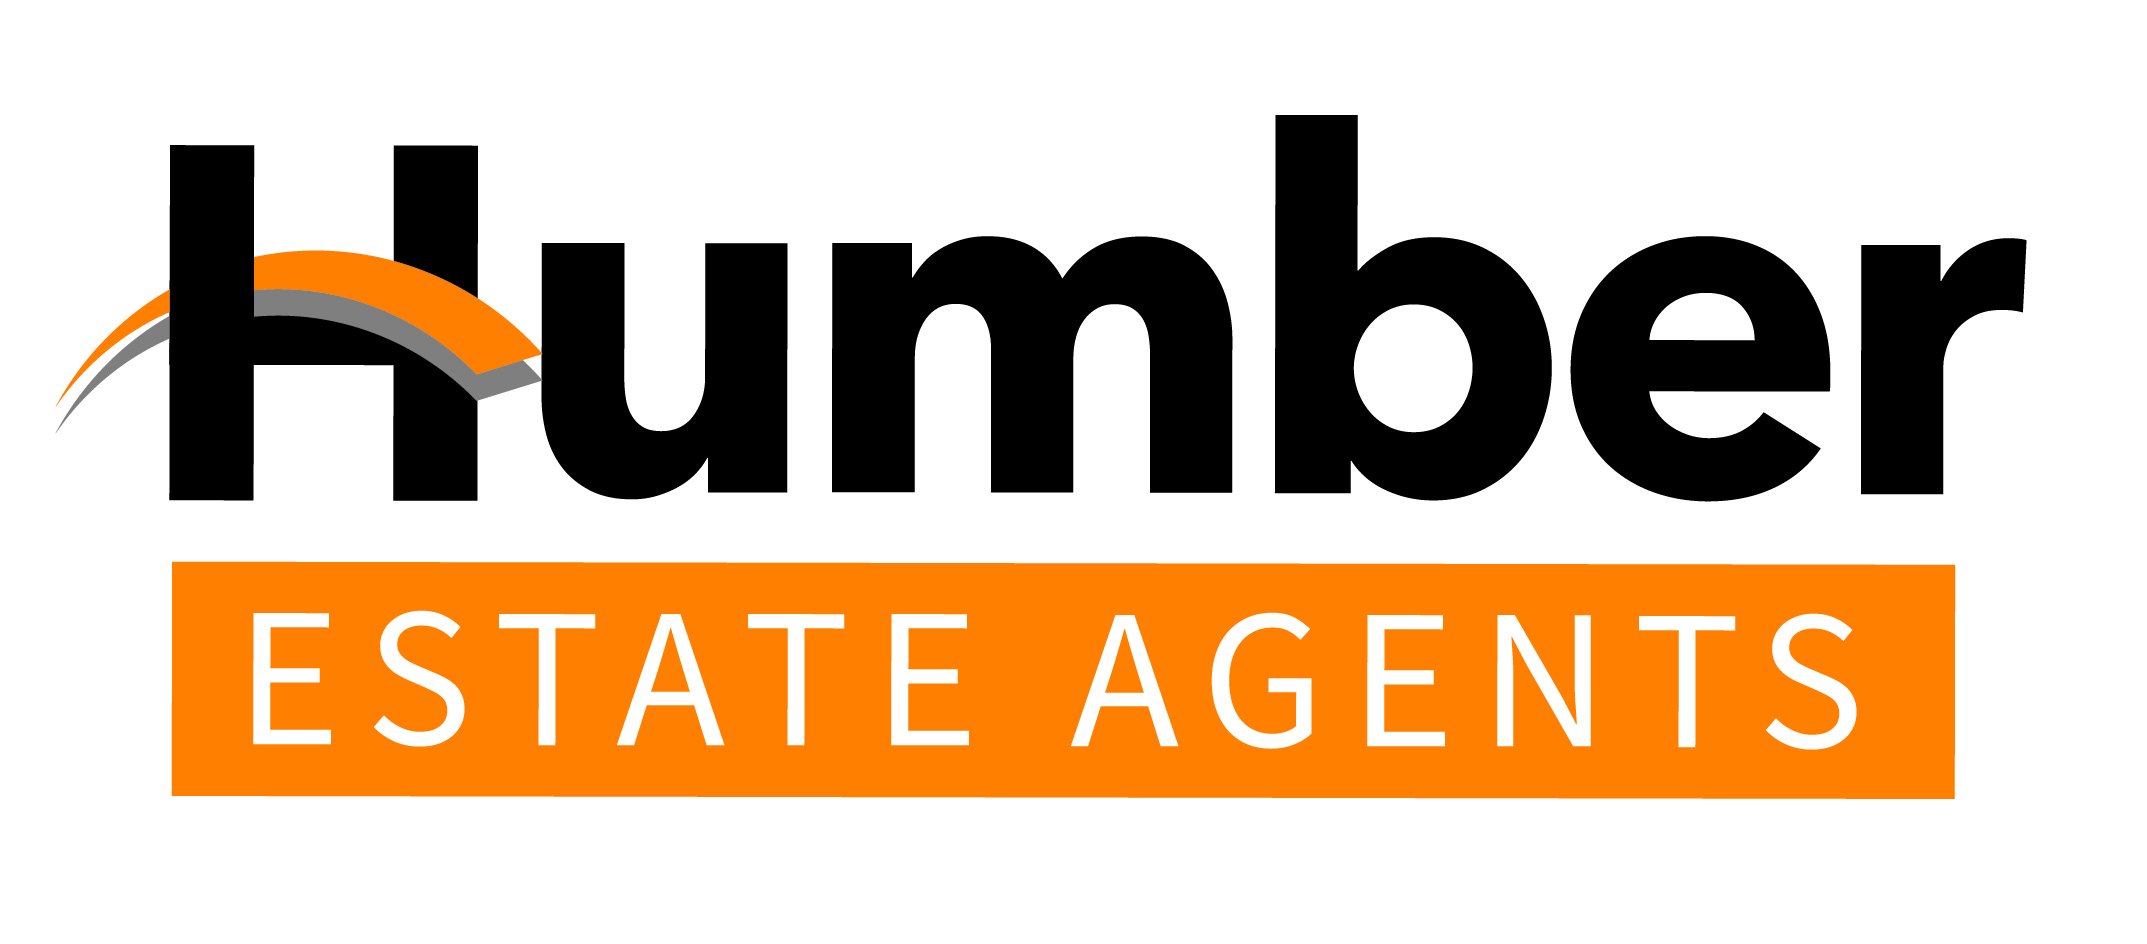 Humber Estate Agents